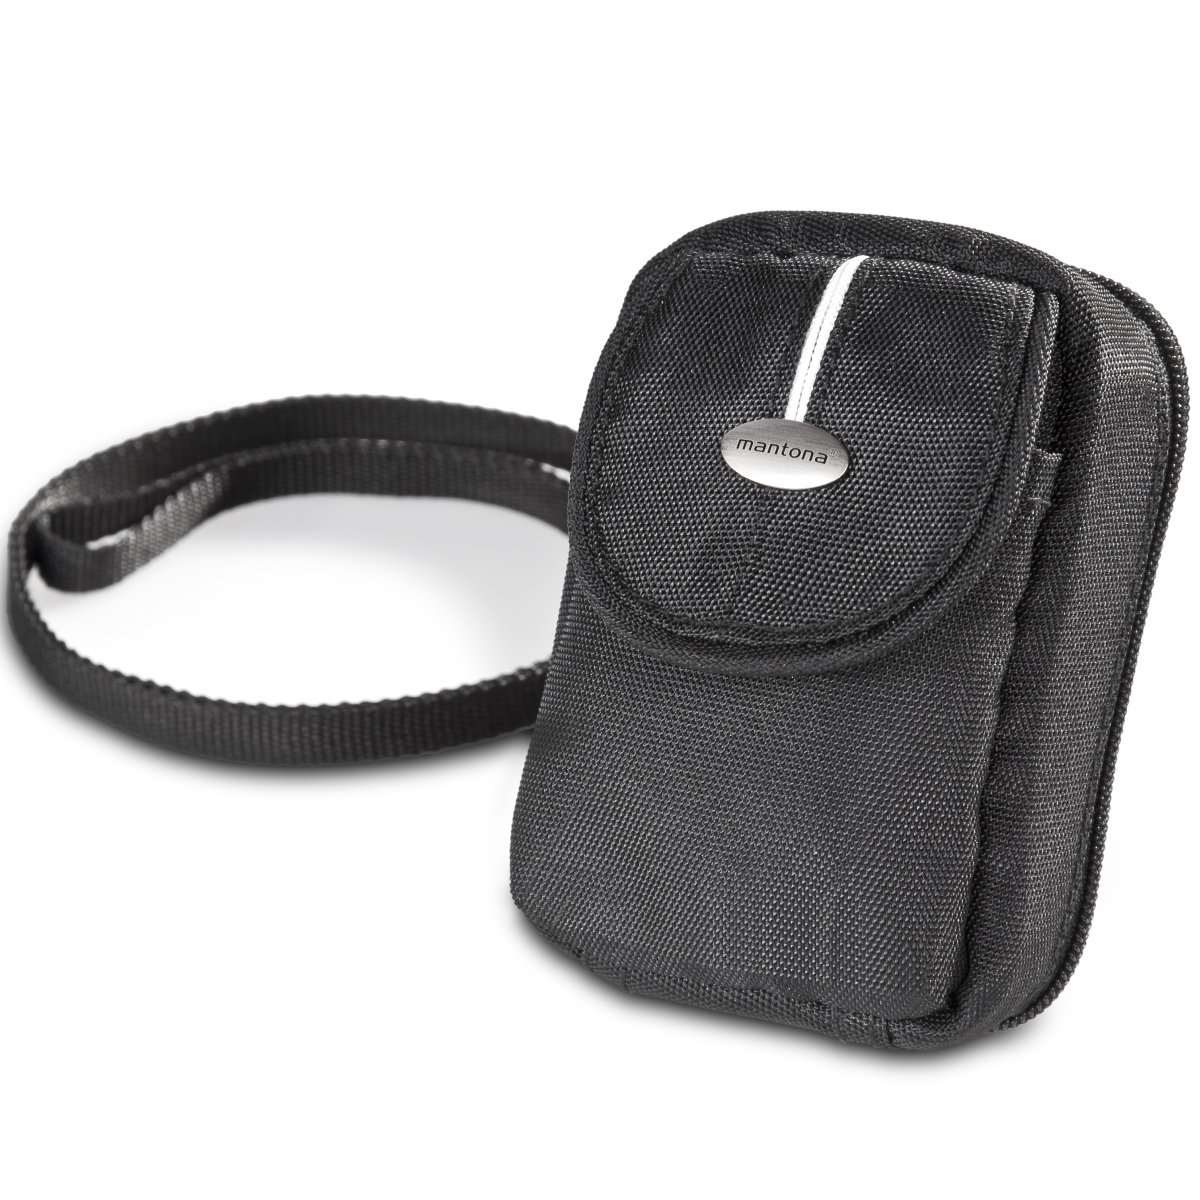 Mantona Jaspis Camera Bag